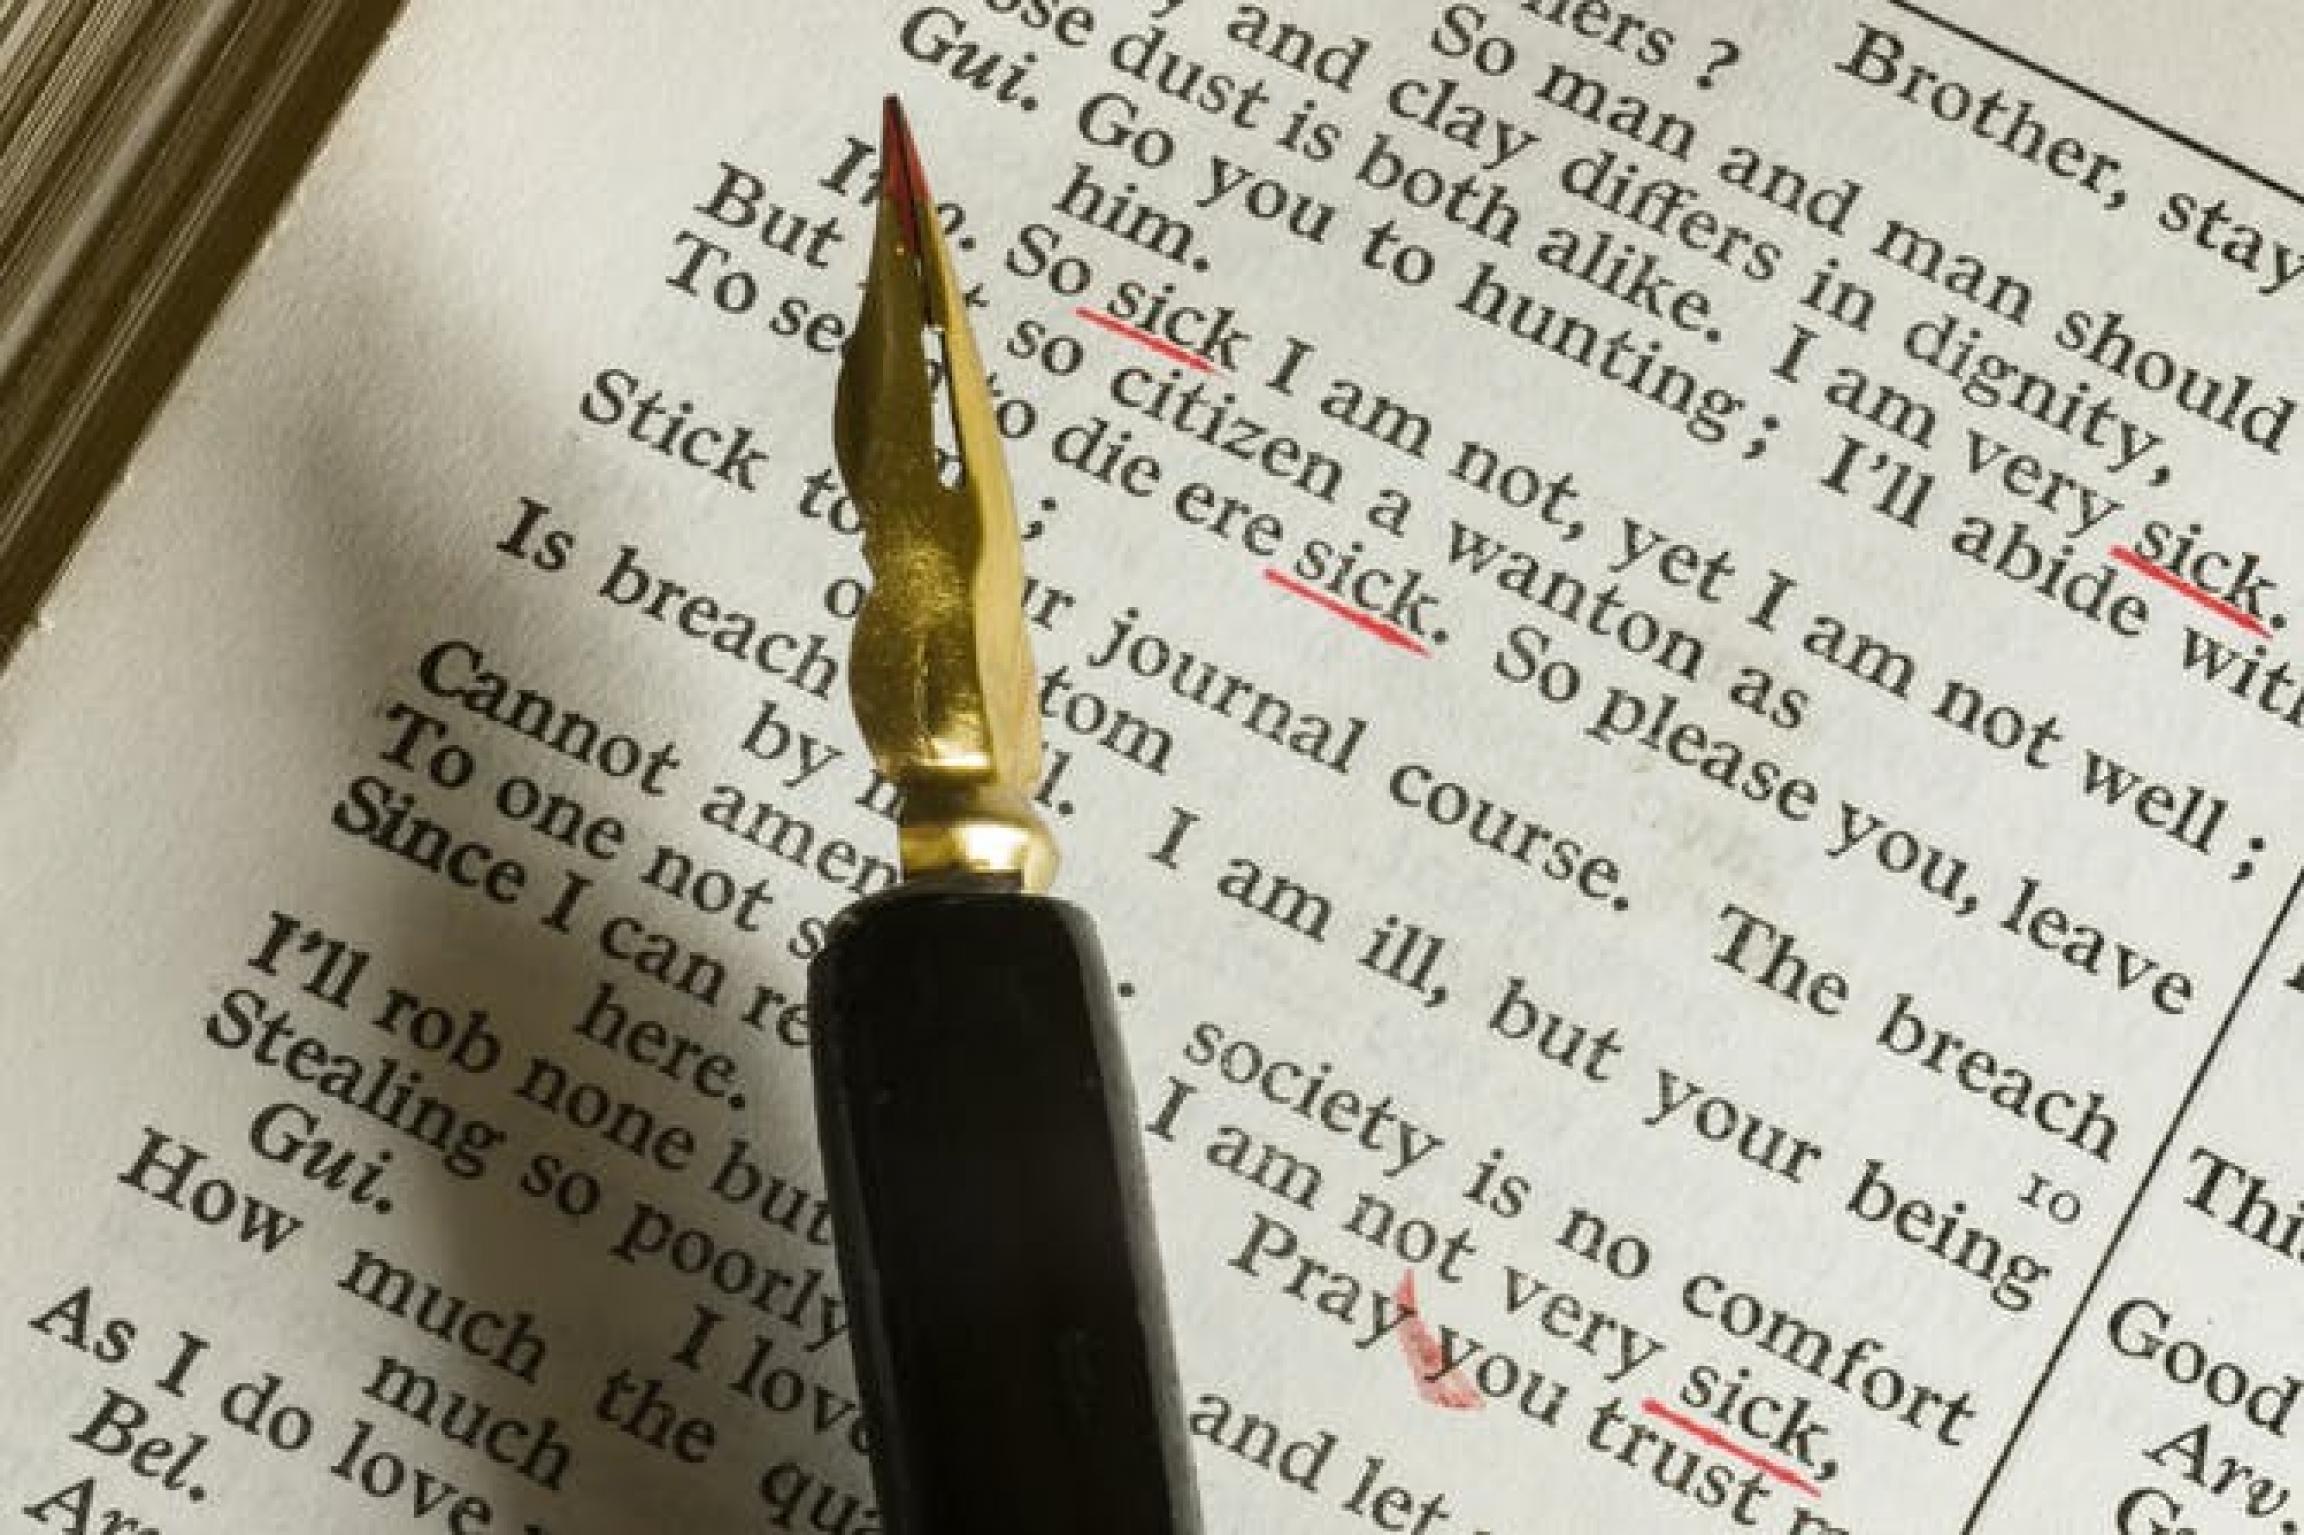 A fountain pen underlining key words in text.